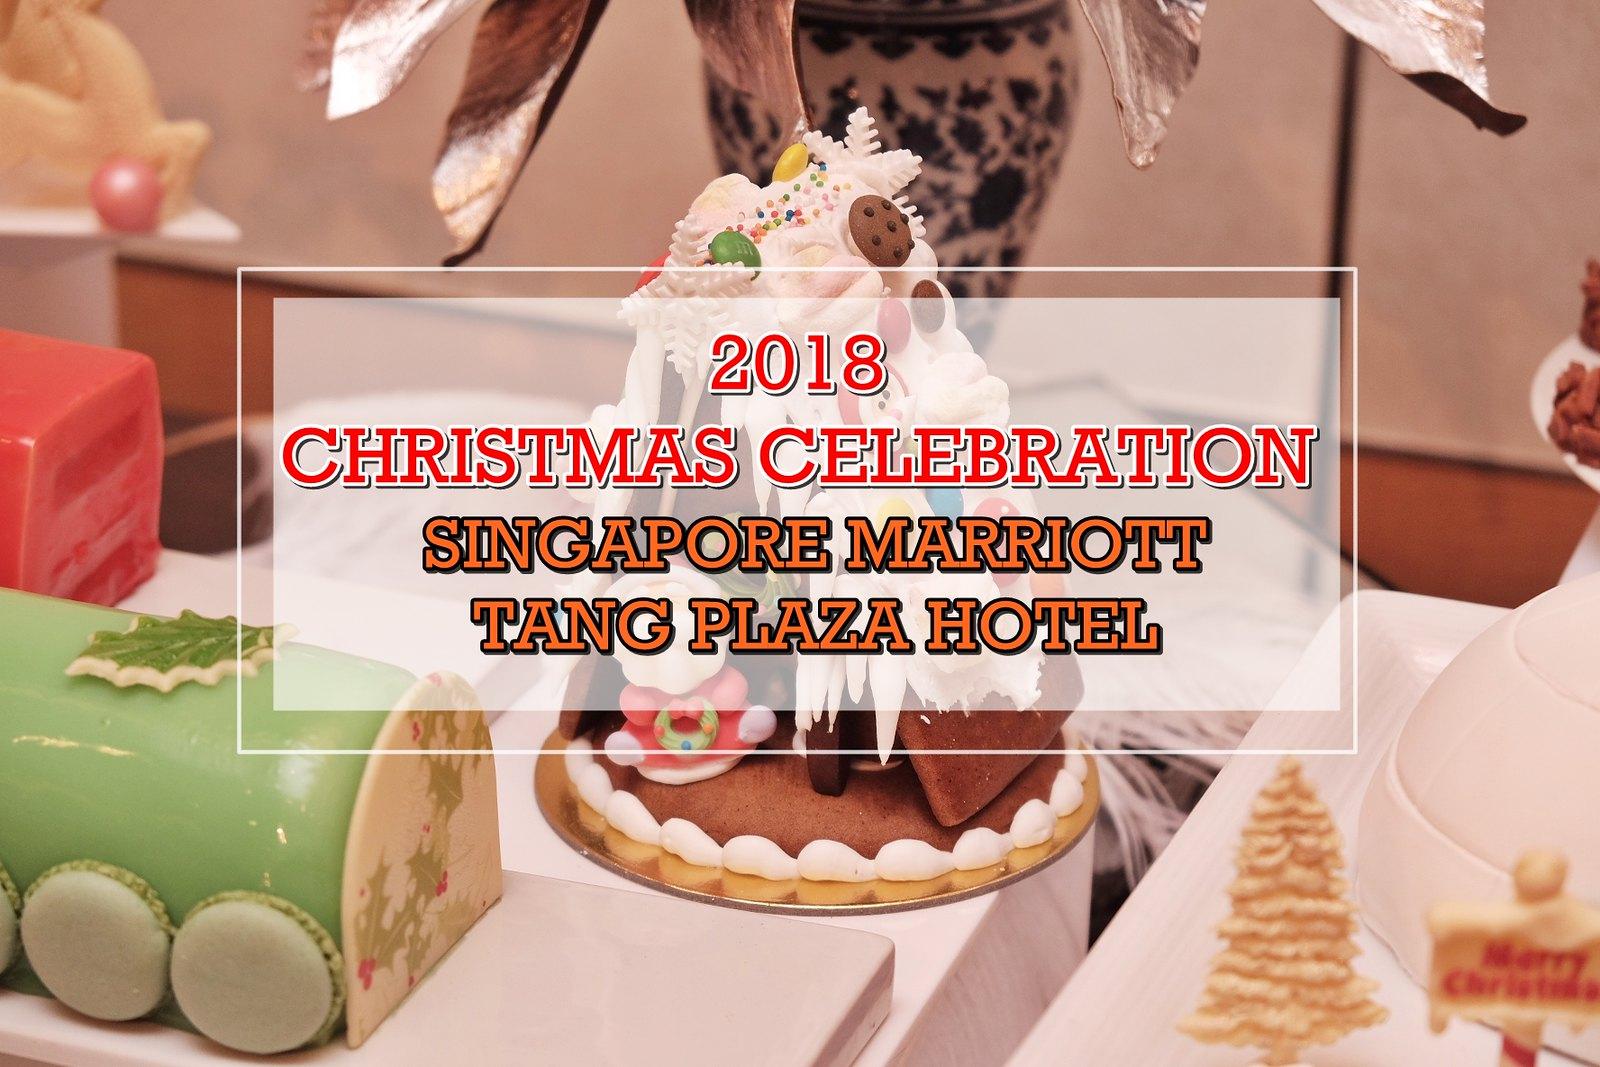 [SG EATS] 2018 Christmas Highlights At Singapore Marriott Tang Plaza Hotel